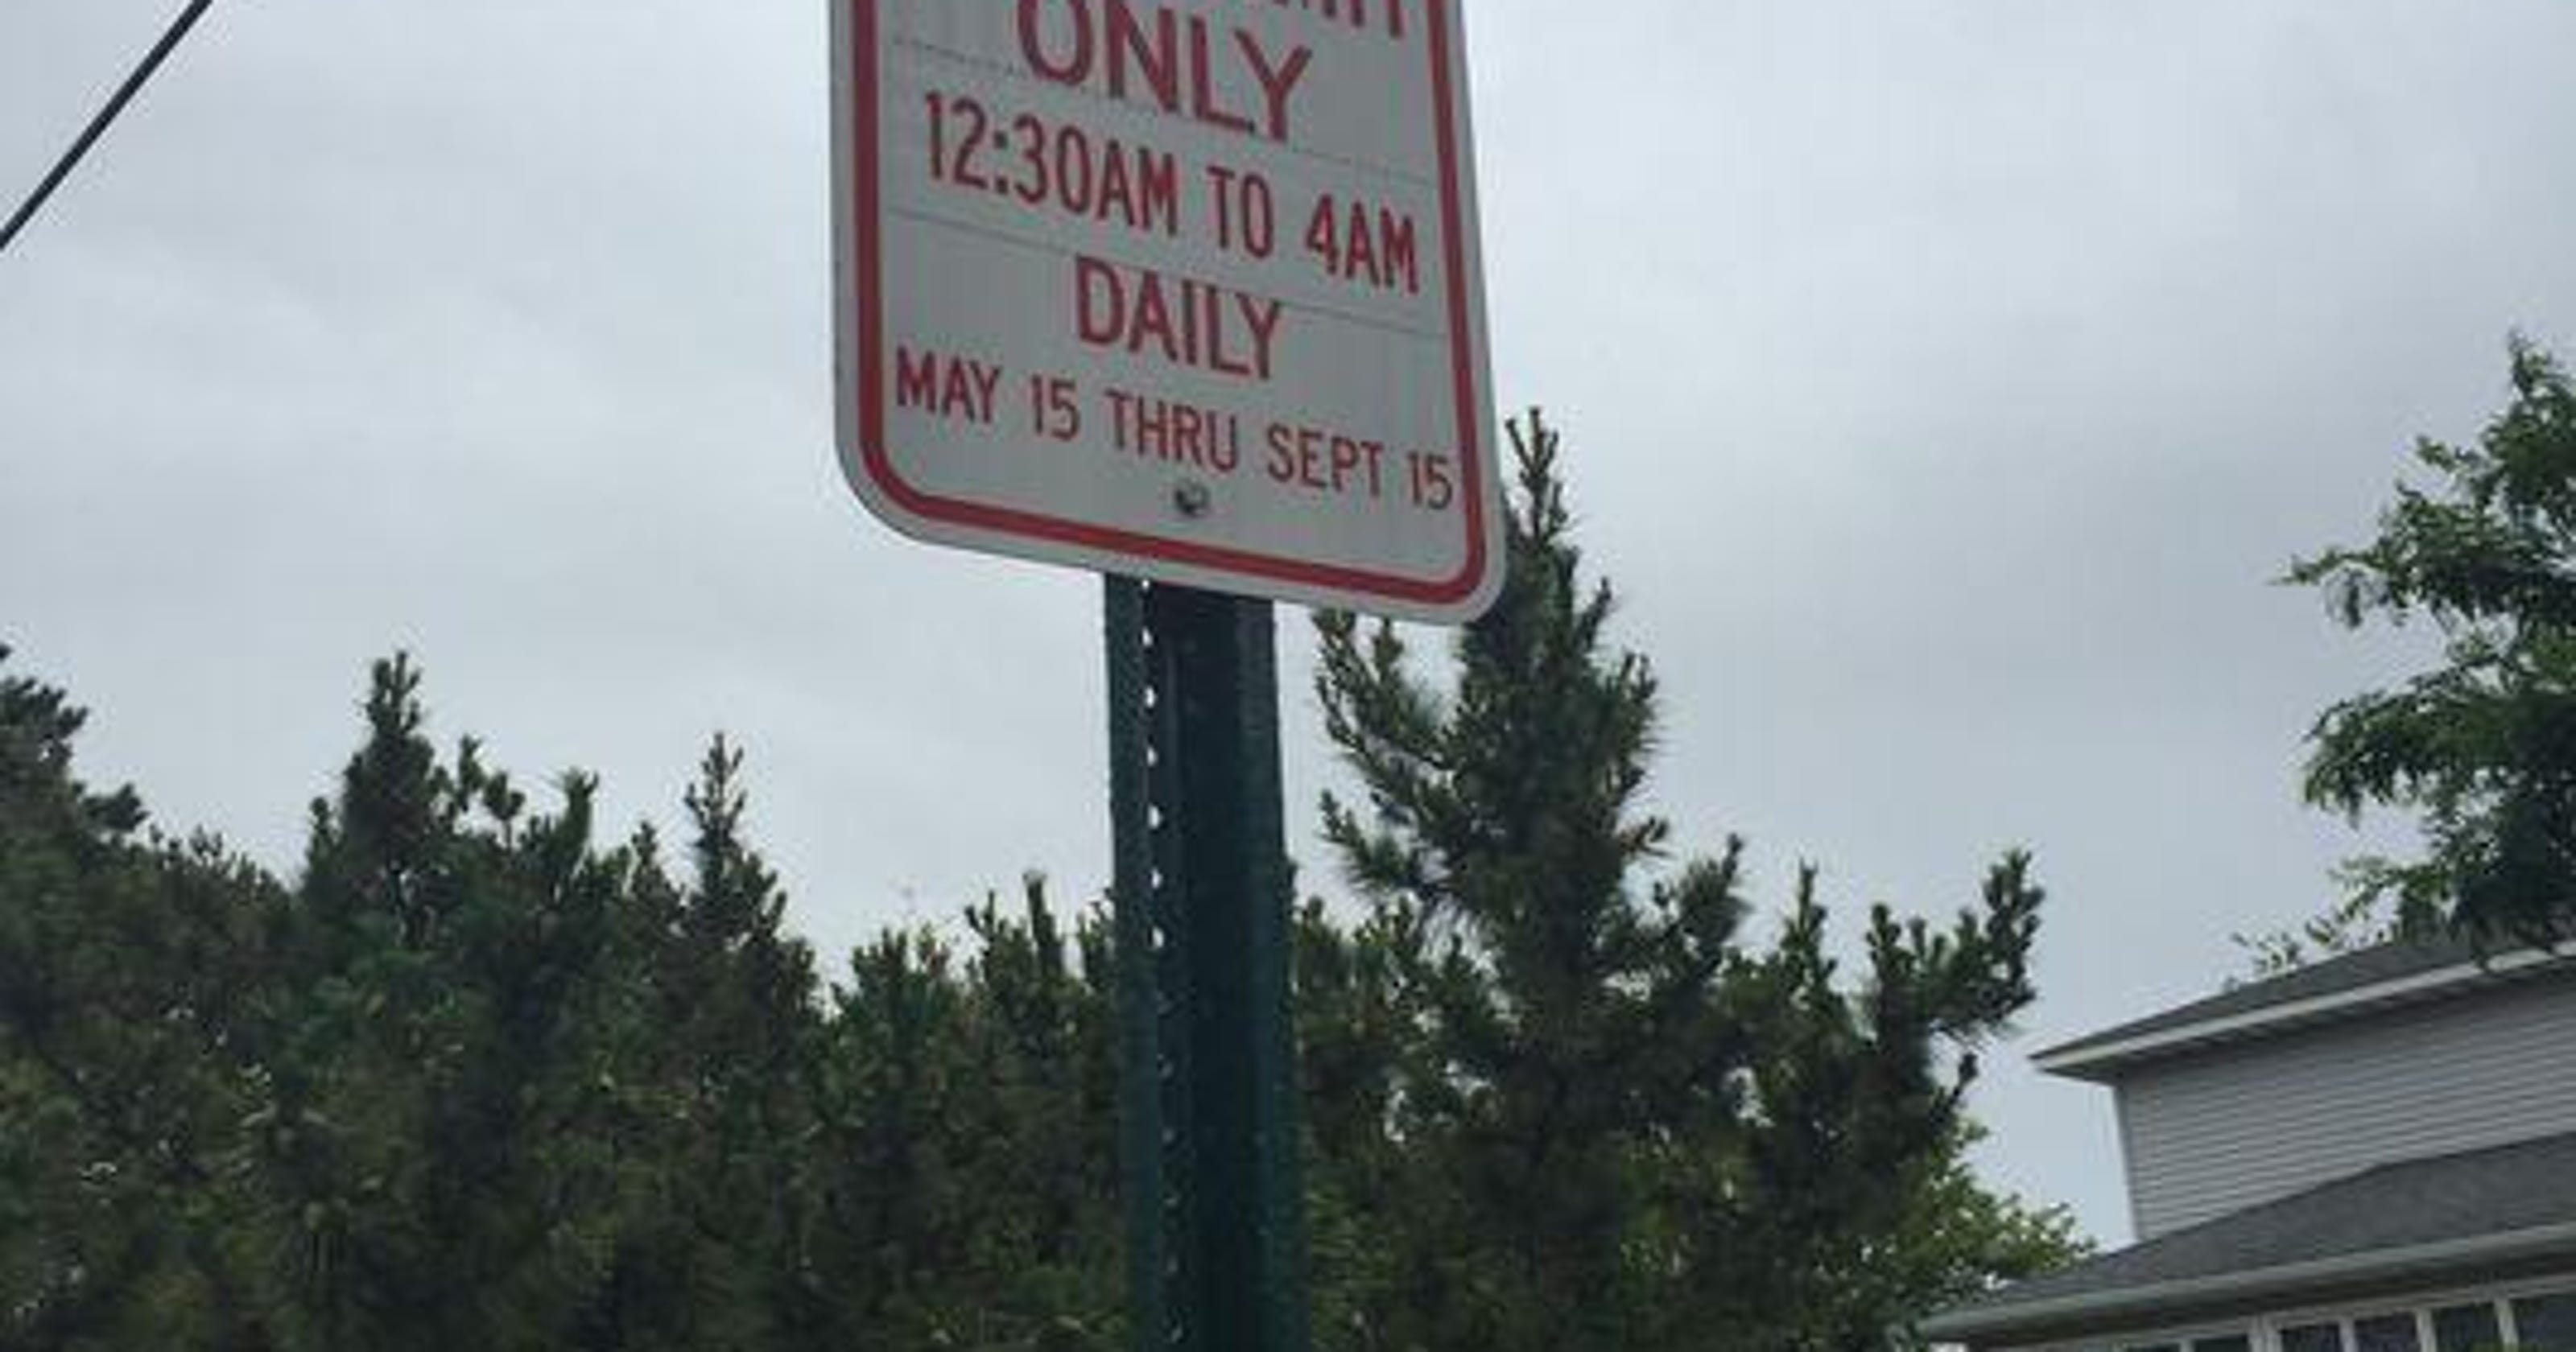 Point Pleasant Beach Parking Rules